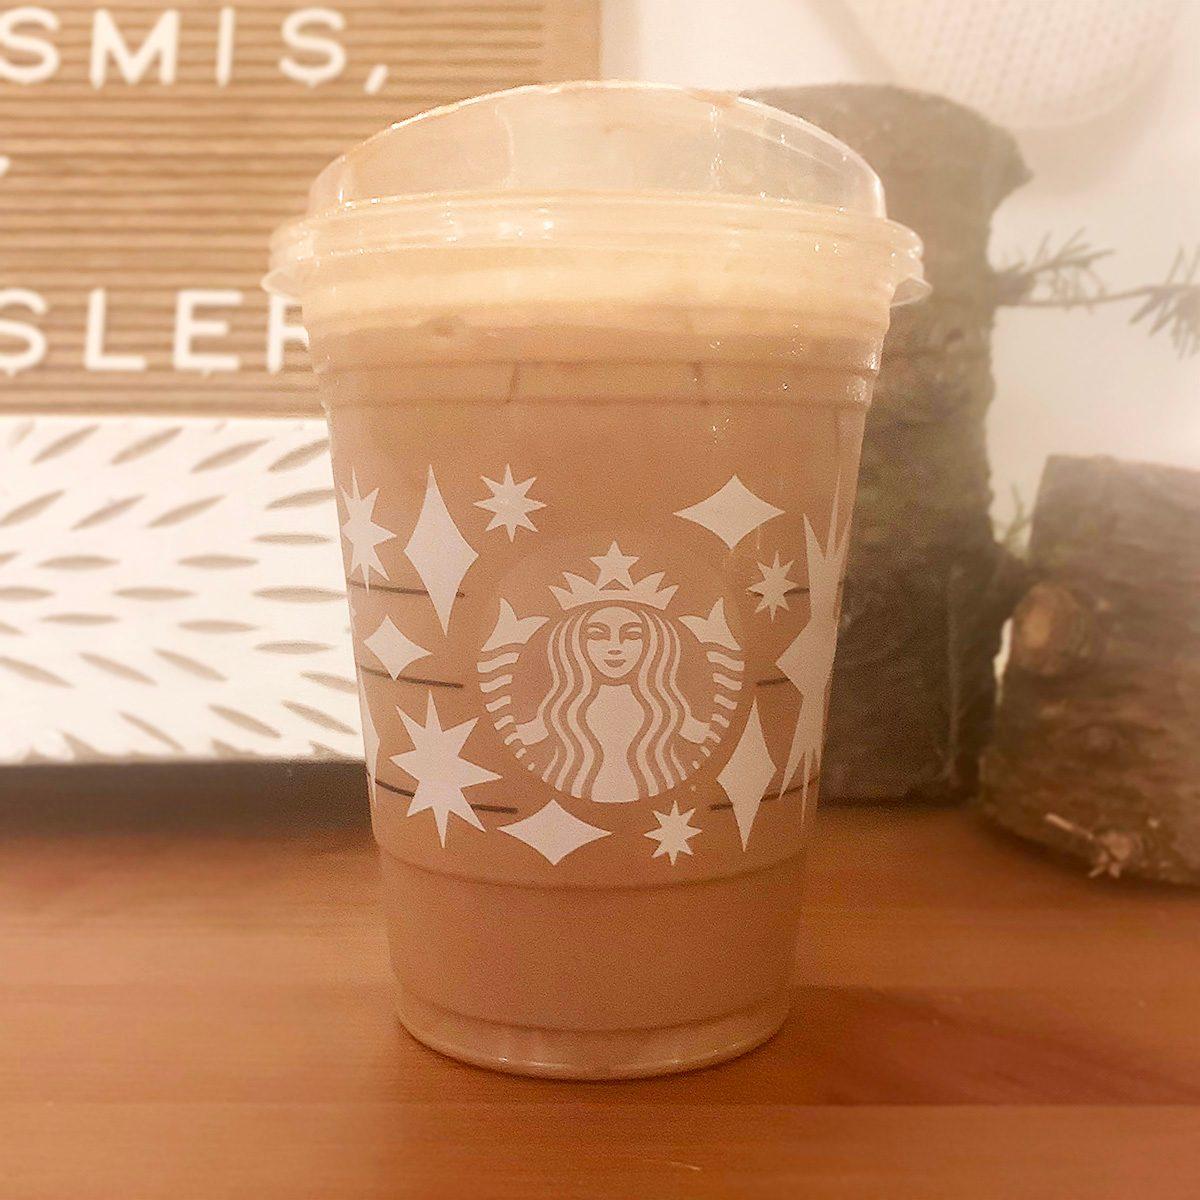 Starbucks snickerdoodle cold brew